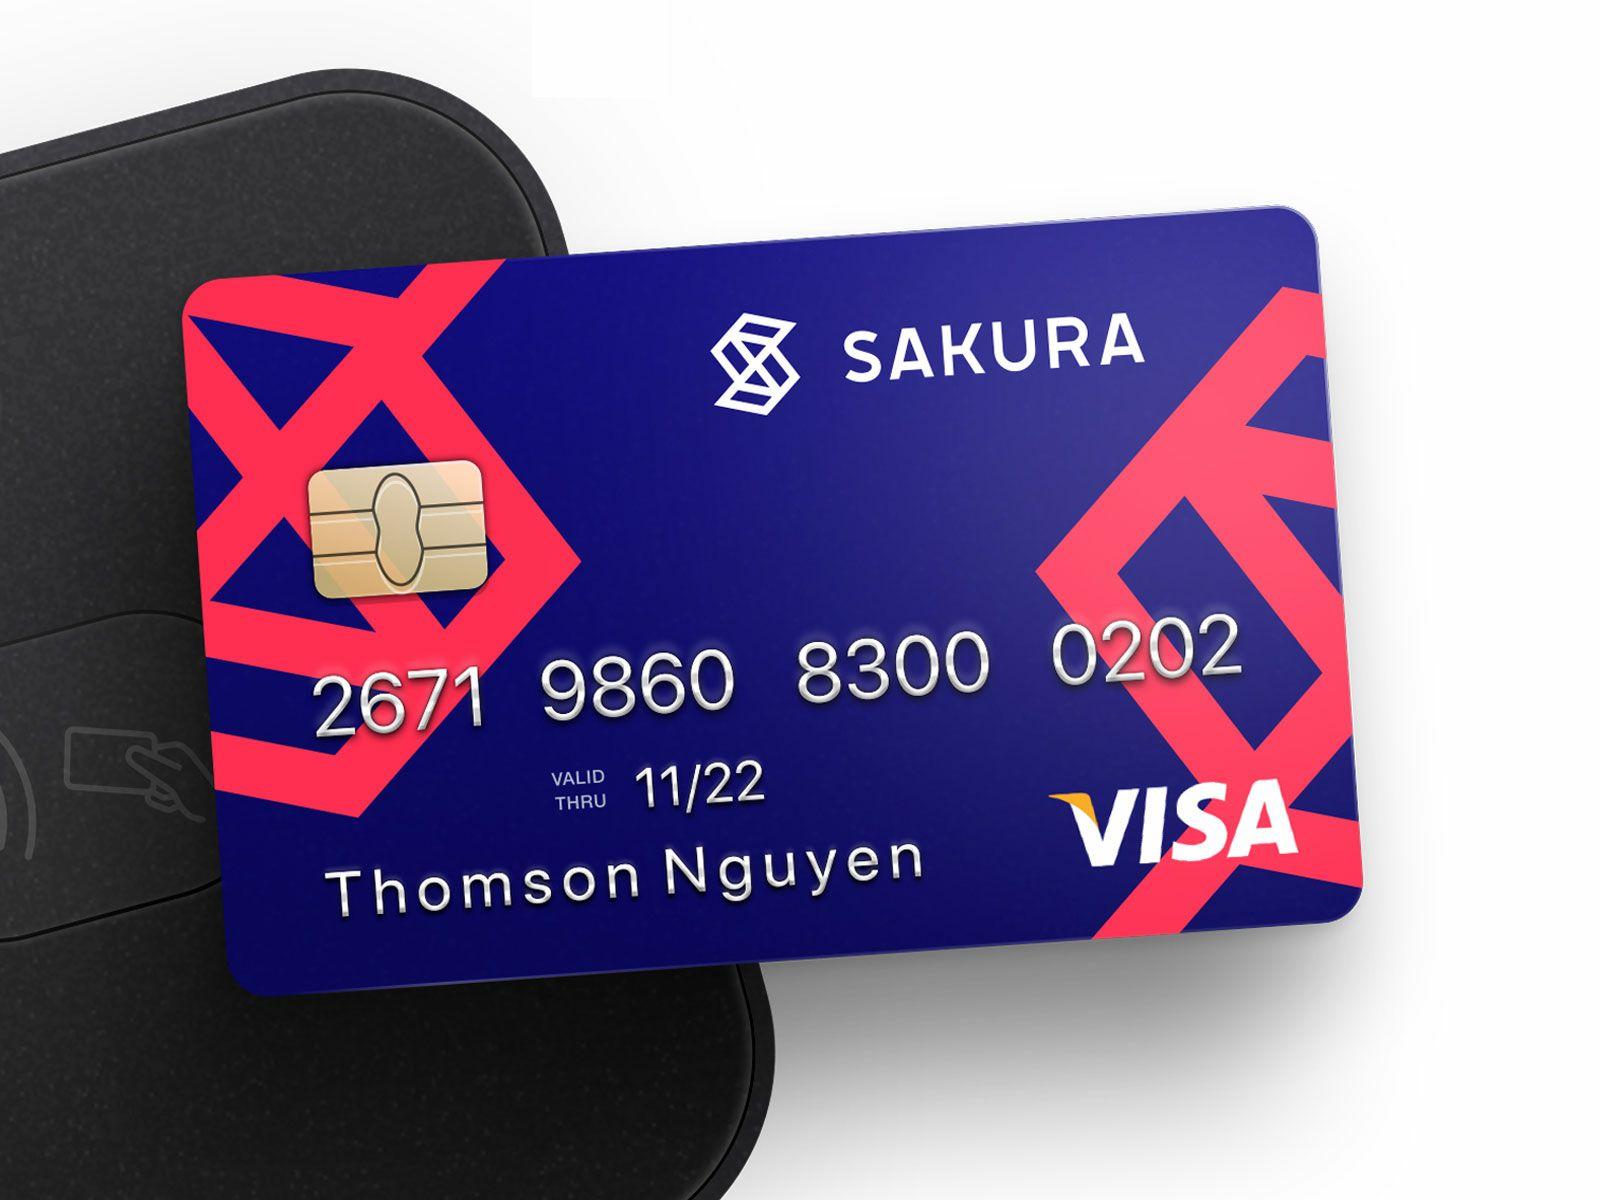 Sakura Credit Card Design Gift Card Number Best Photoshop Actions